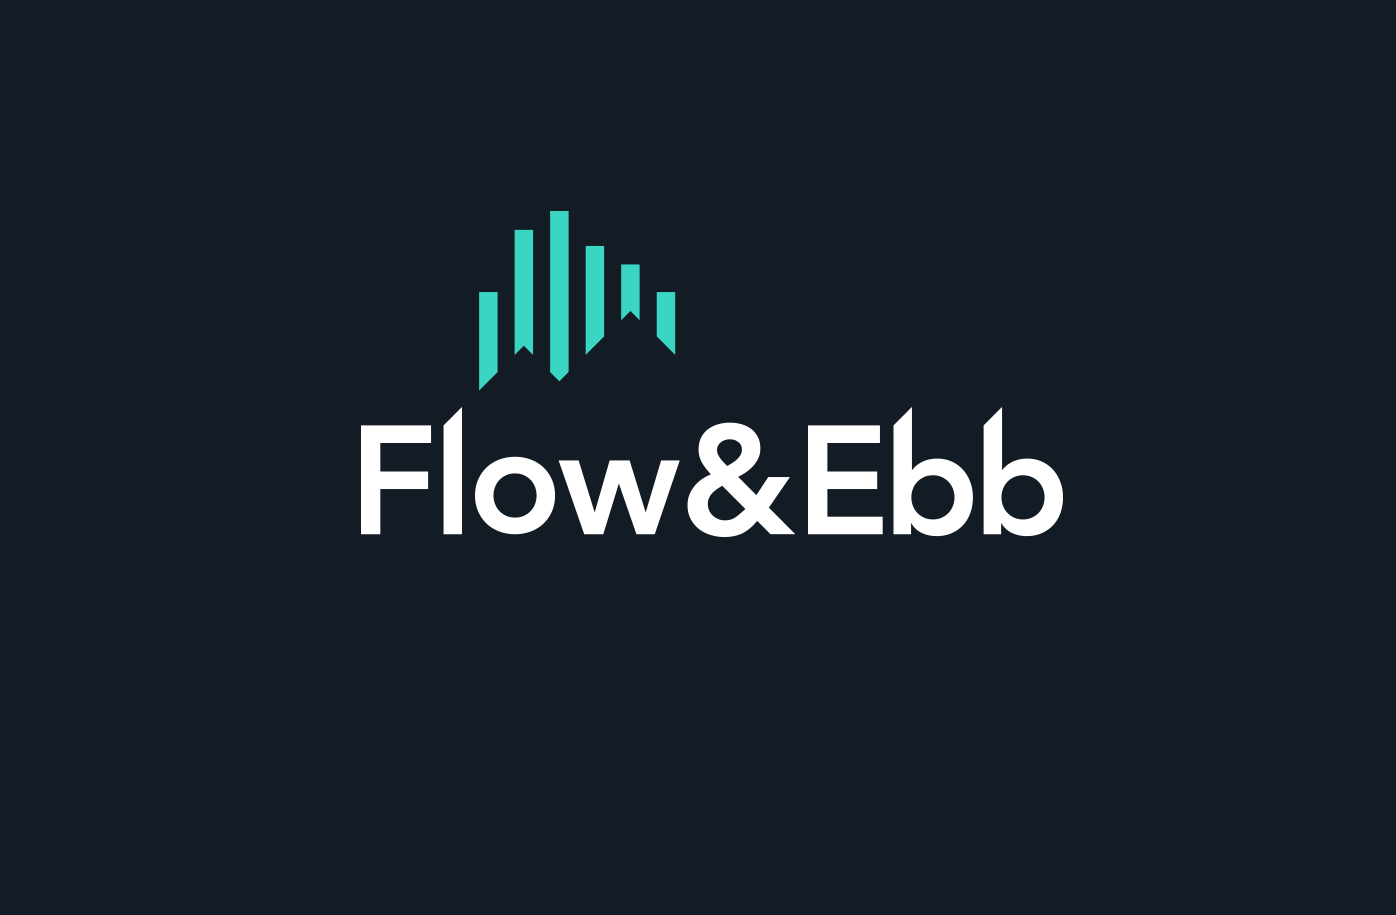 Flow&Ebb logo